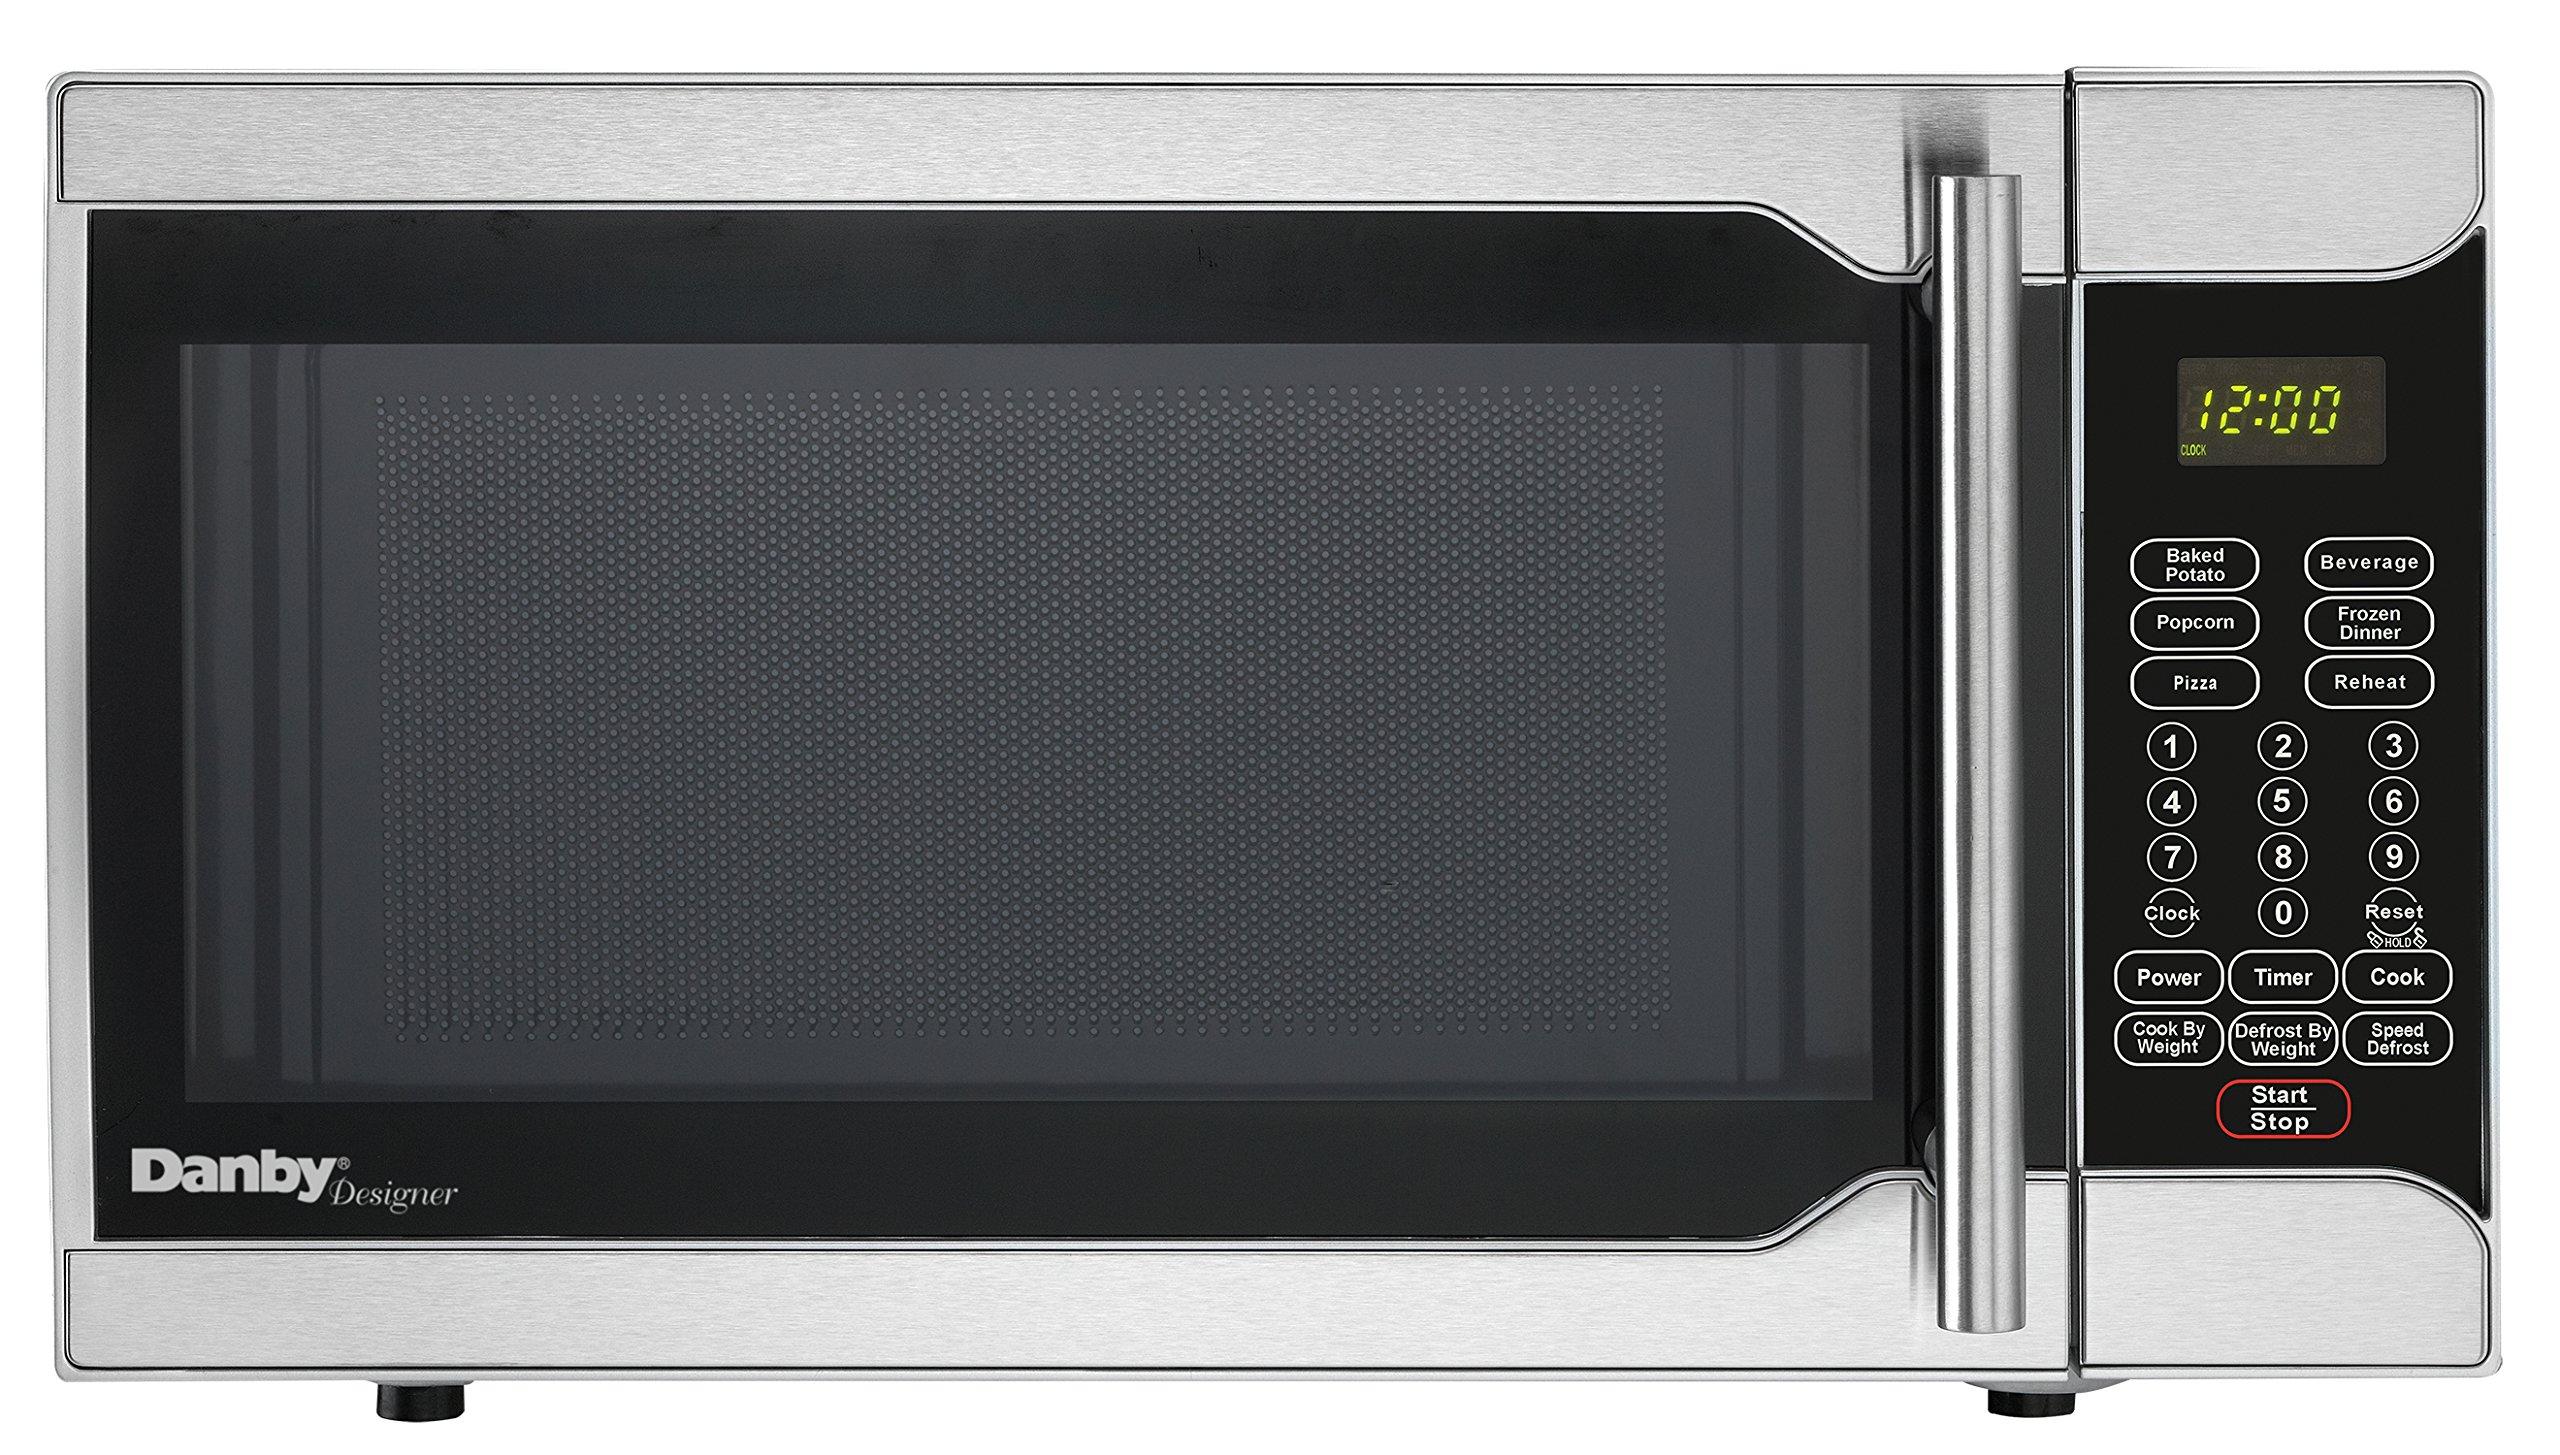 Danby Designer 0 7 cu Microwave